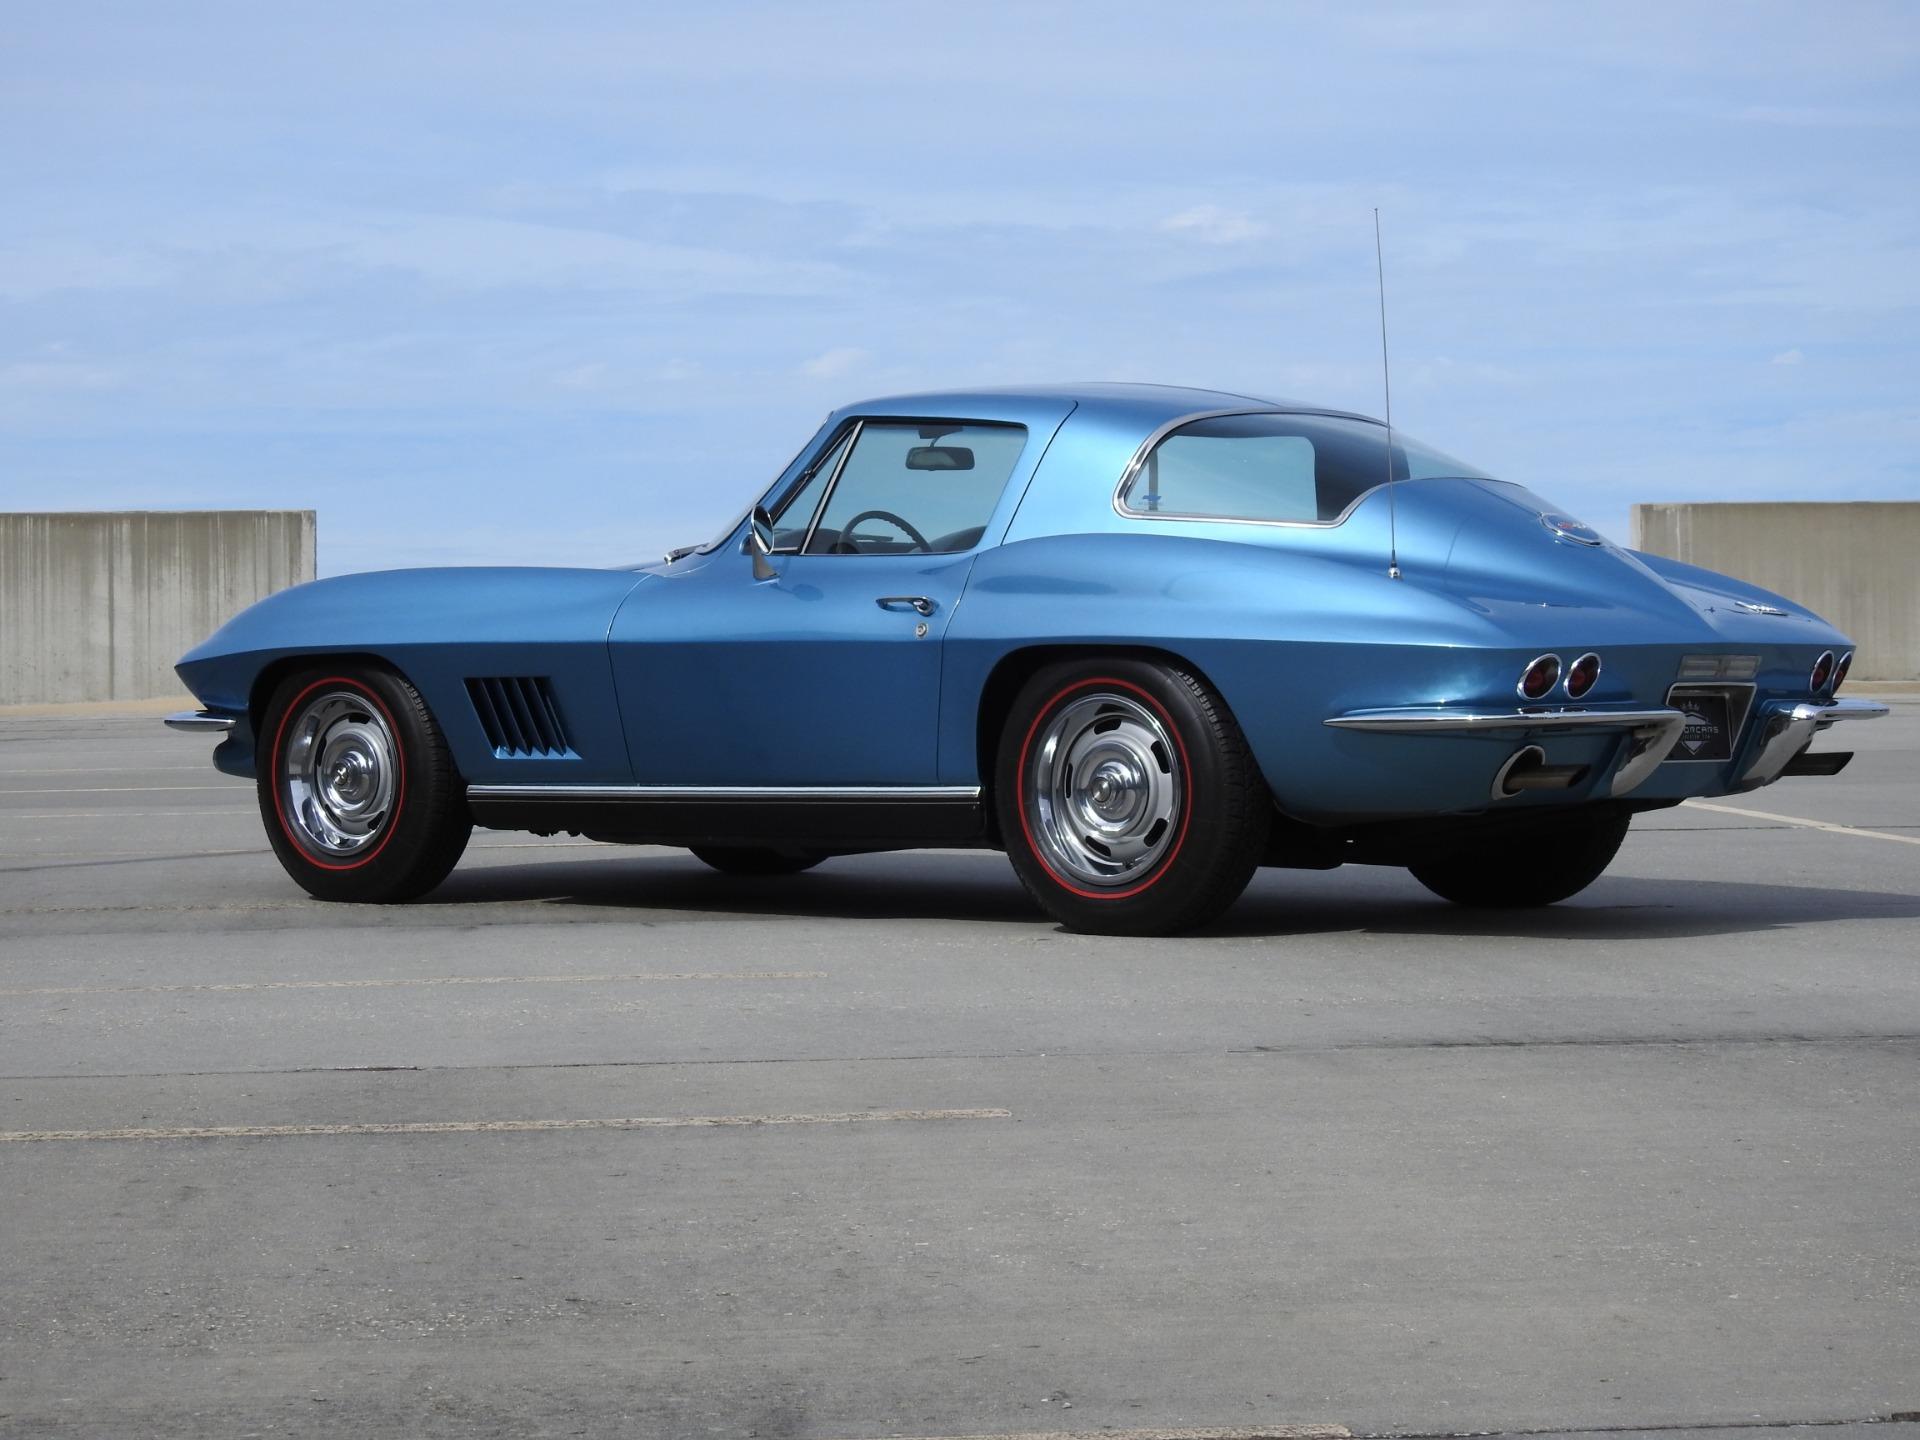 Used-1967-Chevrolet-Corvette-Coupe-L79-**-67000-Original-Miles-**-Jackson-MS